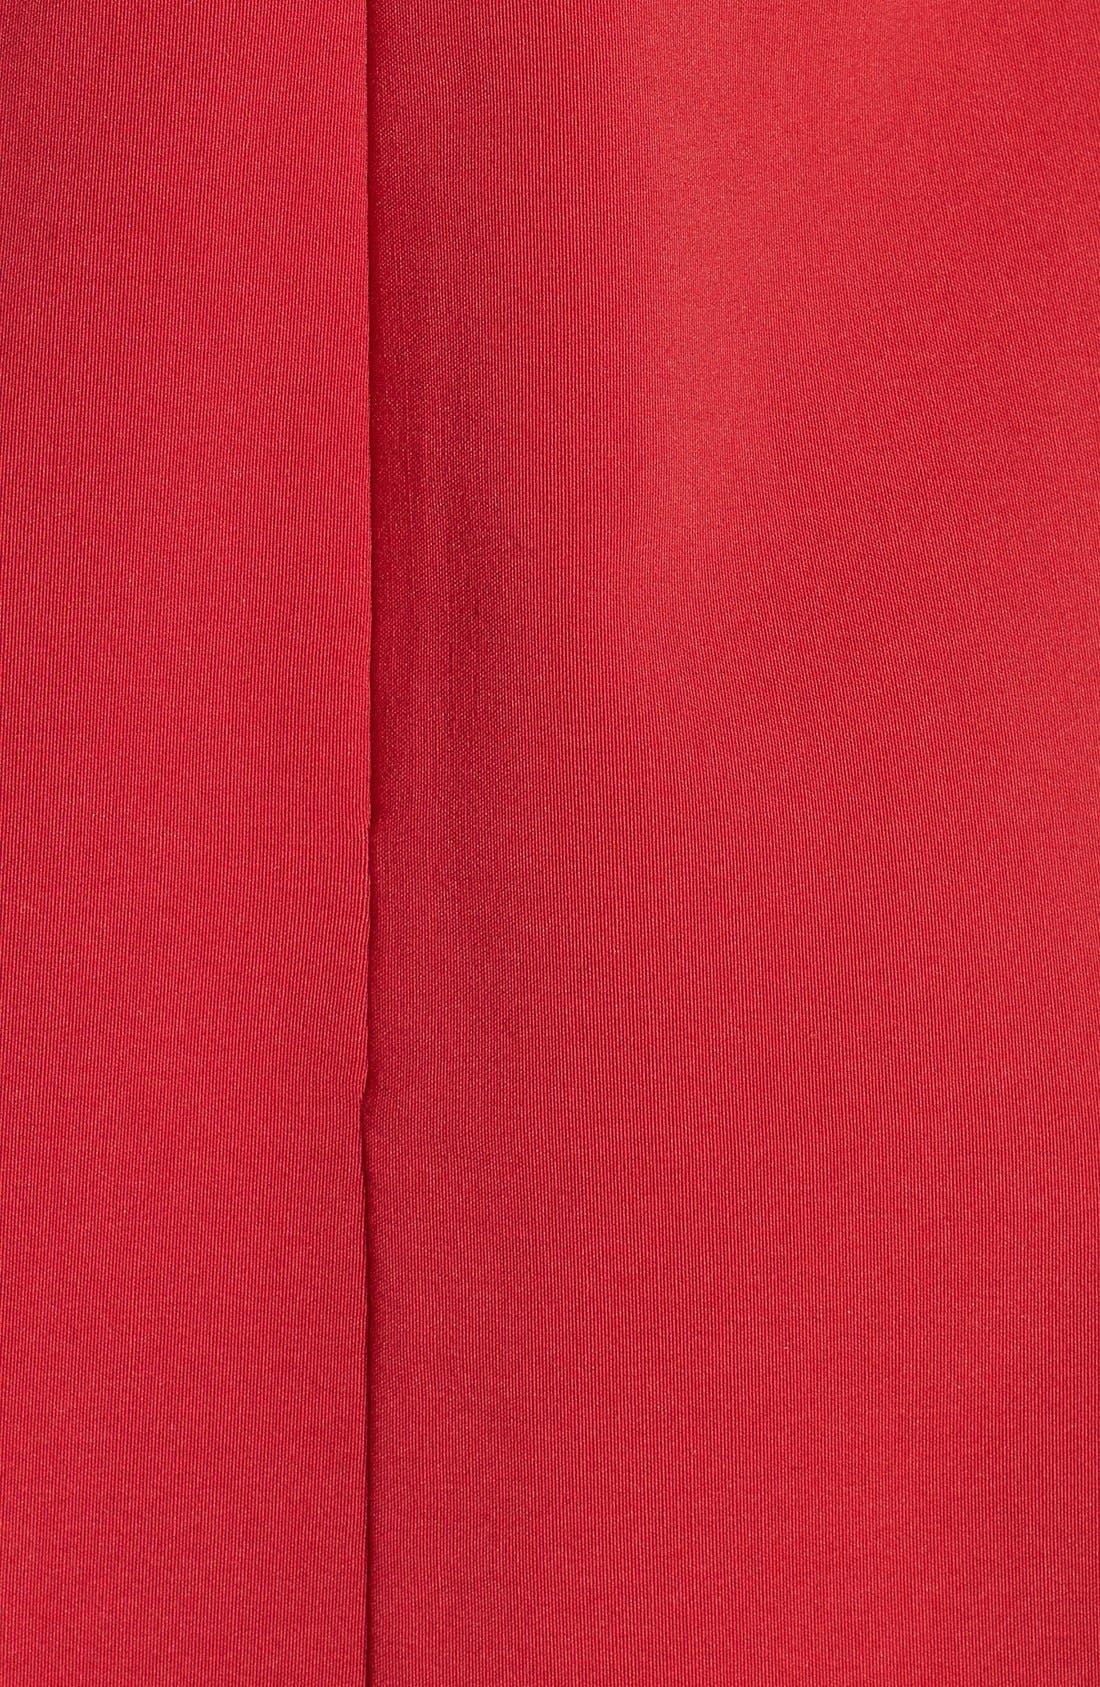 Scallop Trim Skater Dress,                             Alternate thumbnail 3, color,                             600